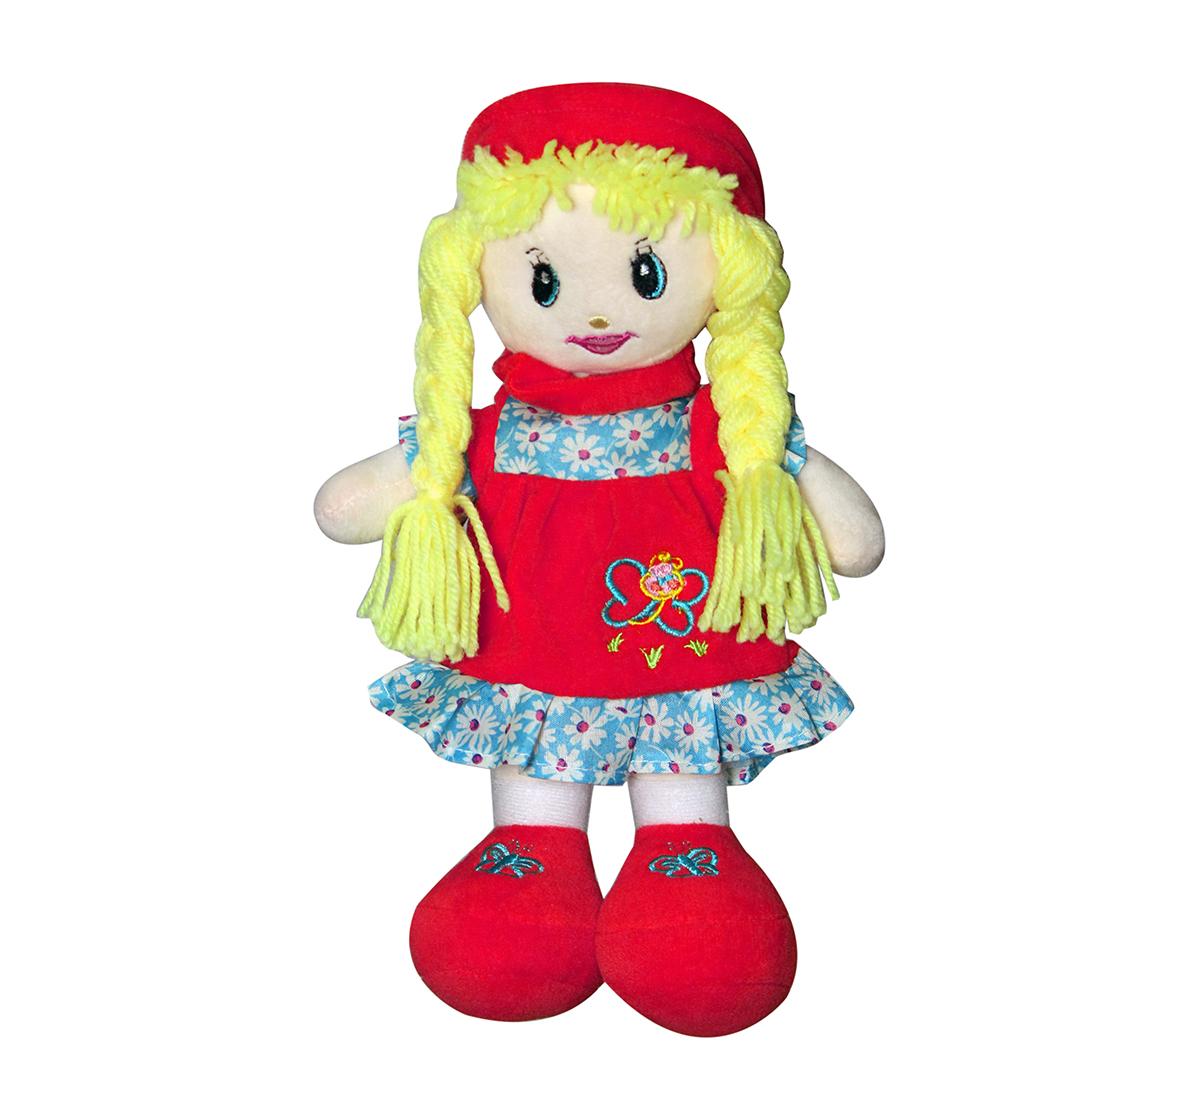 Soft Buddies | Soft Buddies Flamingo Veronical Doll Dolls & Puppets for Kids age 12M+ - 30 Cm